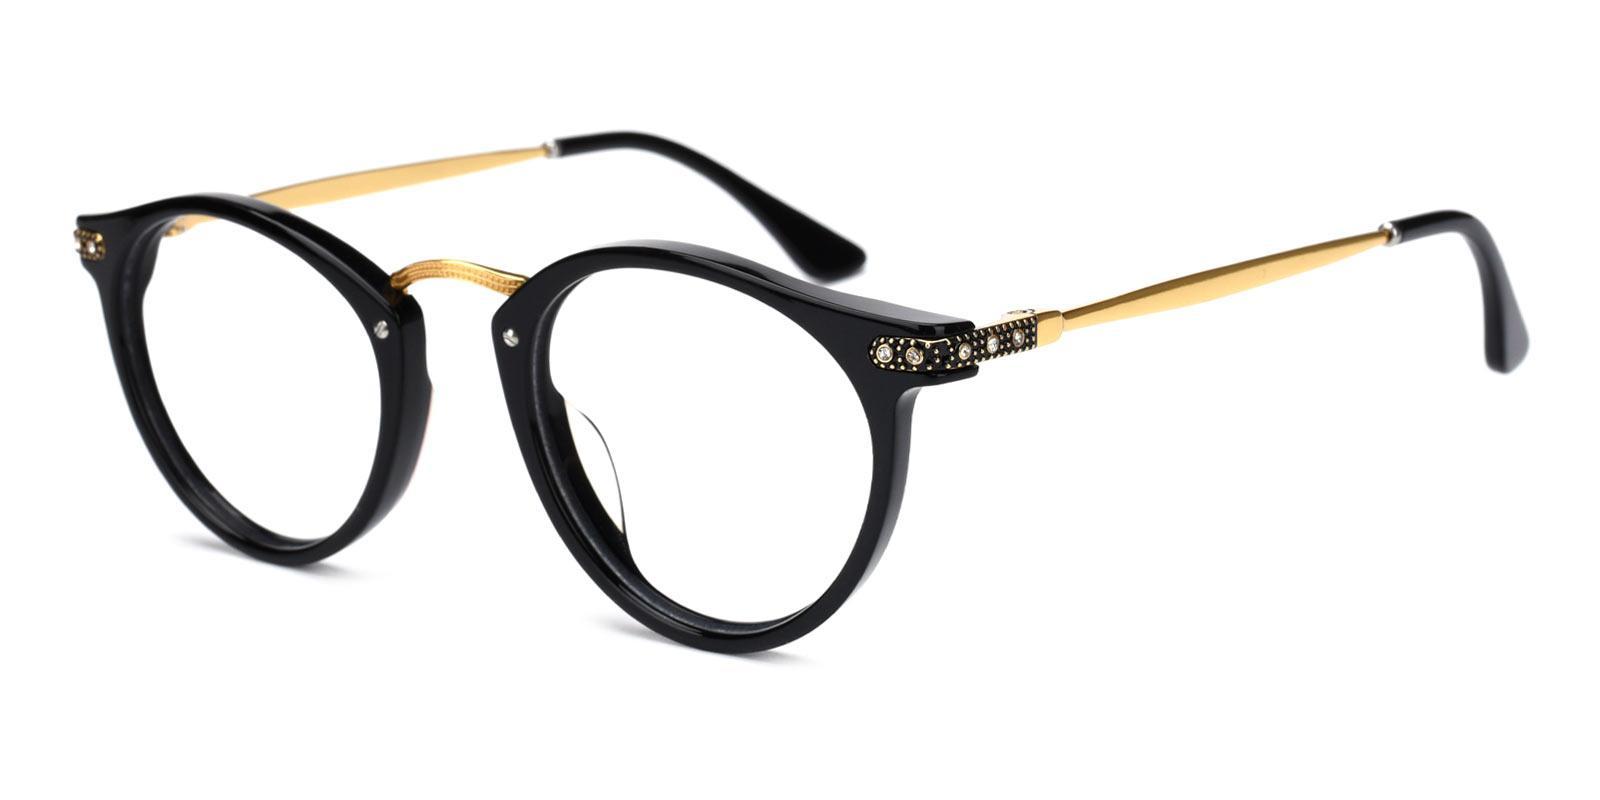 Donna-Black-Round-Acetate-Eyeglasses-additional1